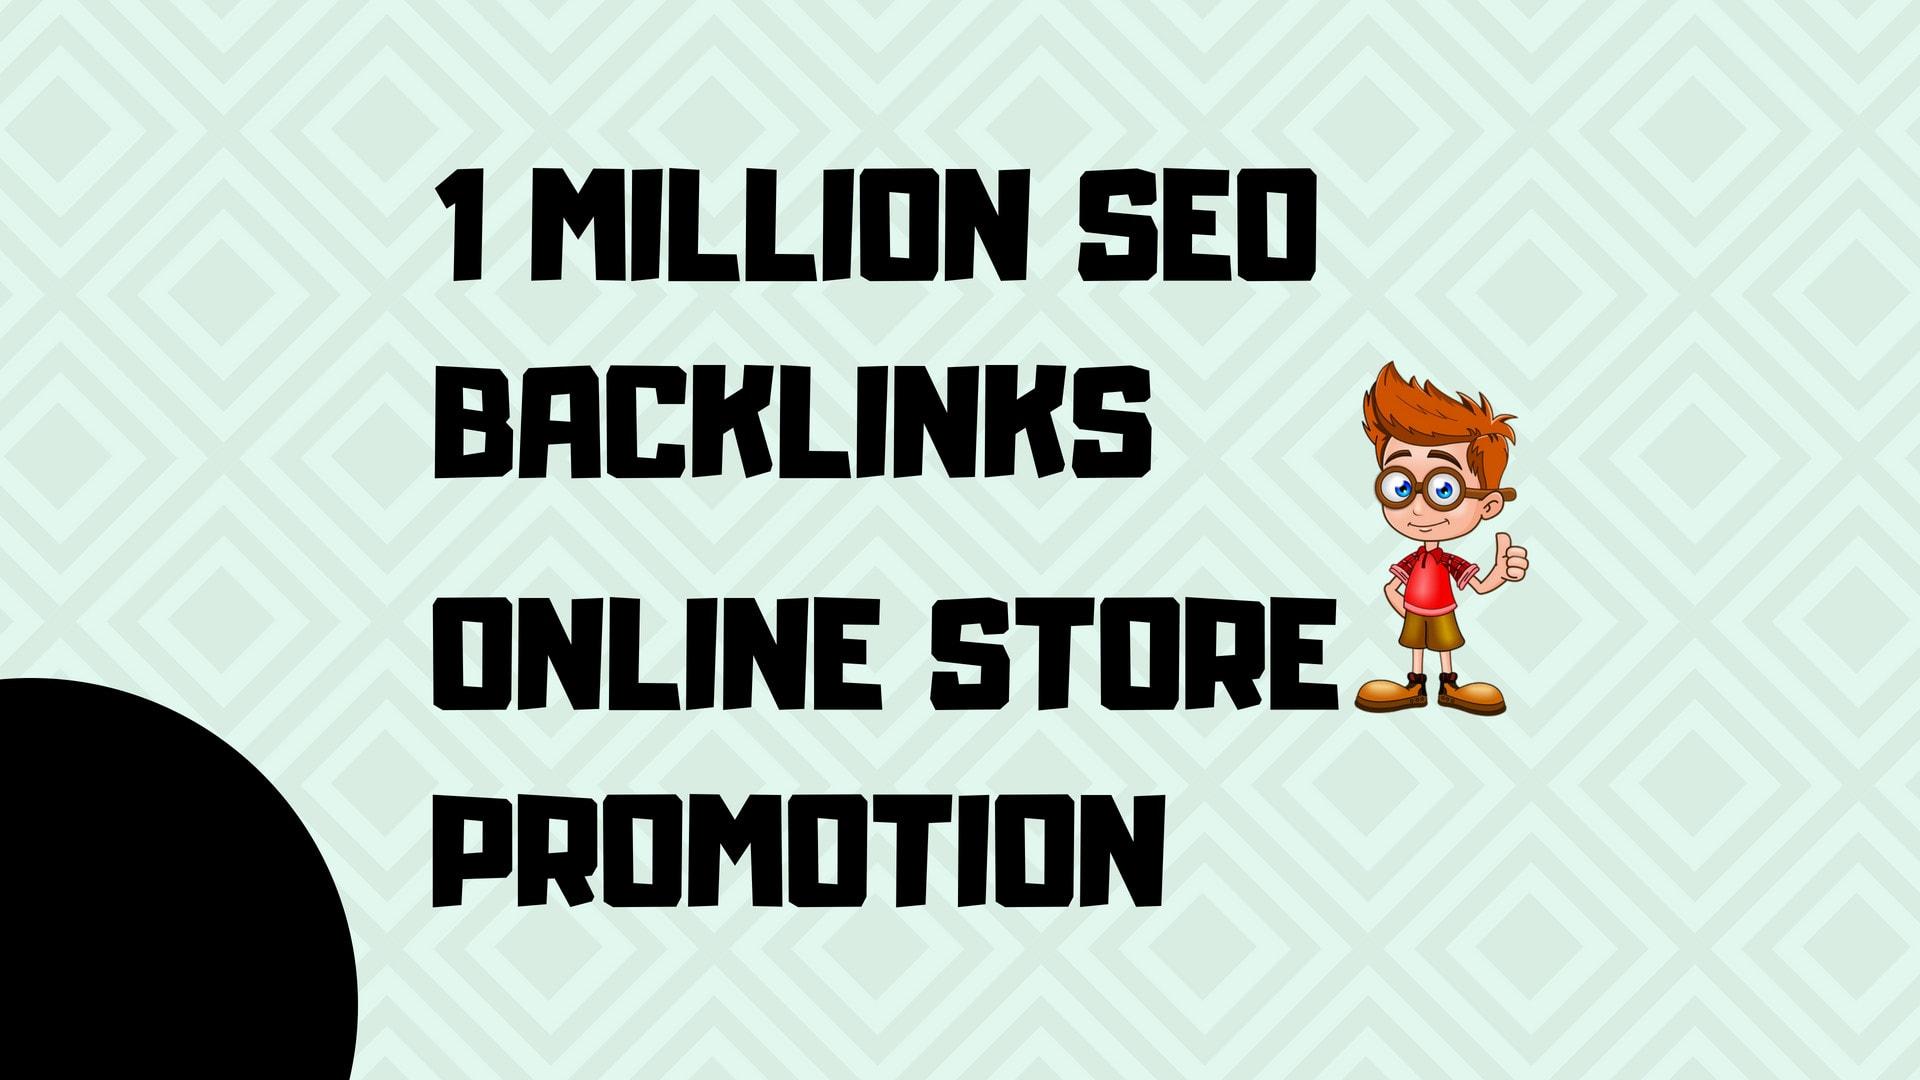 create 1 million seo backlinks for online store promotion